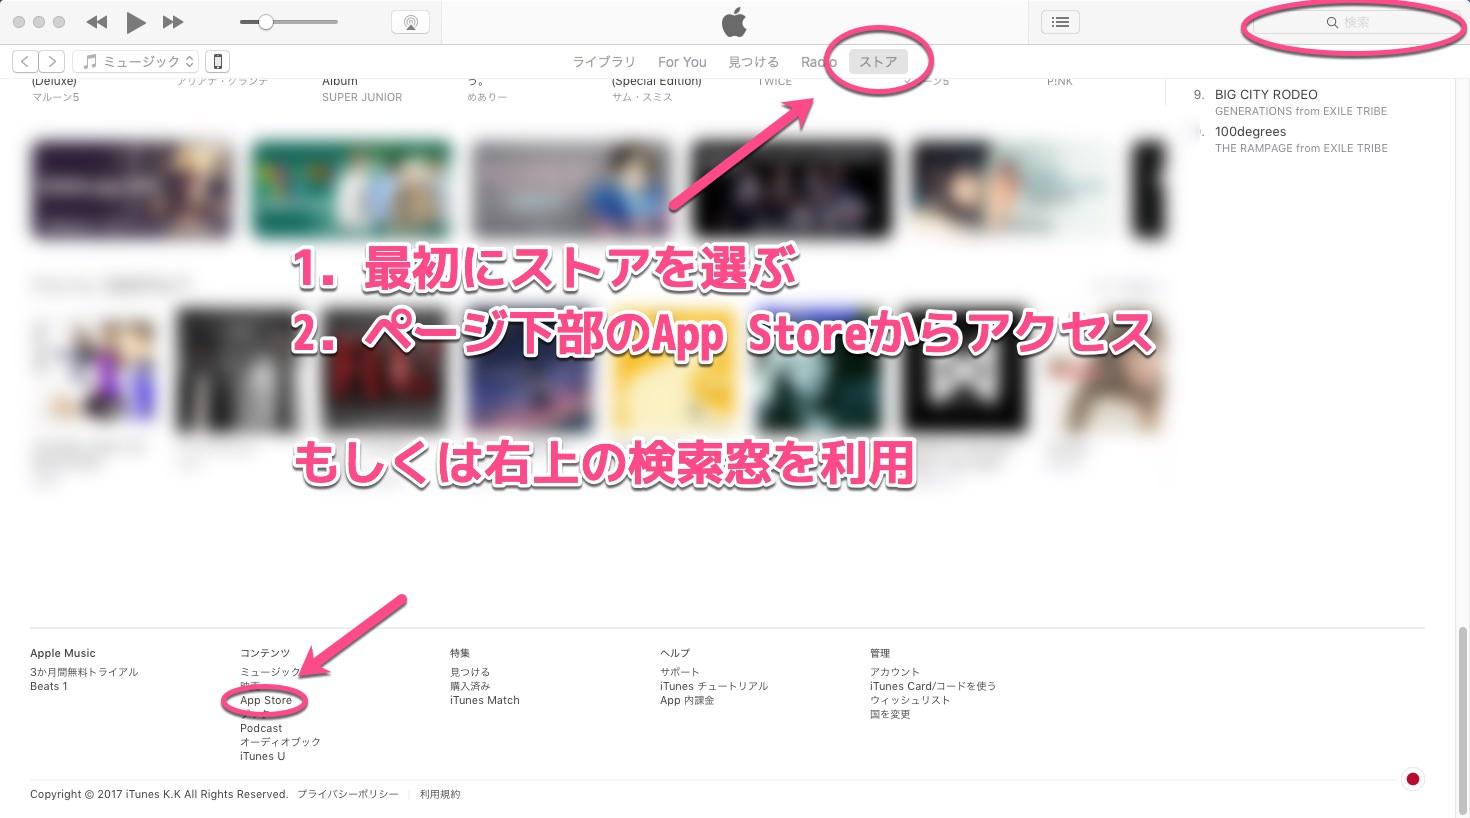 [iPhone] 旧iOS利用中に過去バージョンのiosアプリを購入する方法